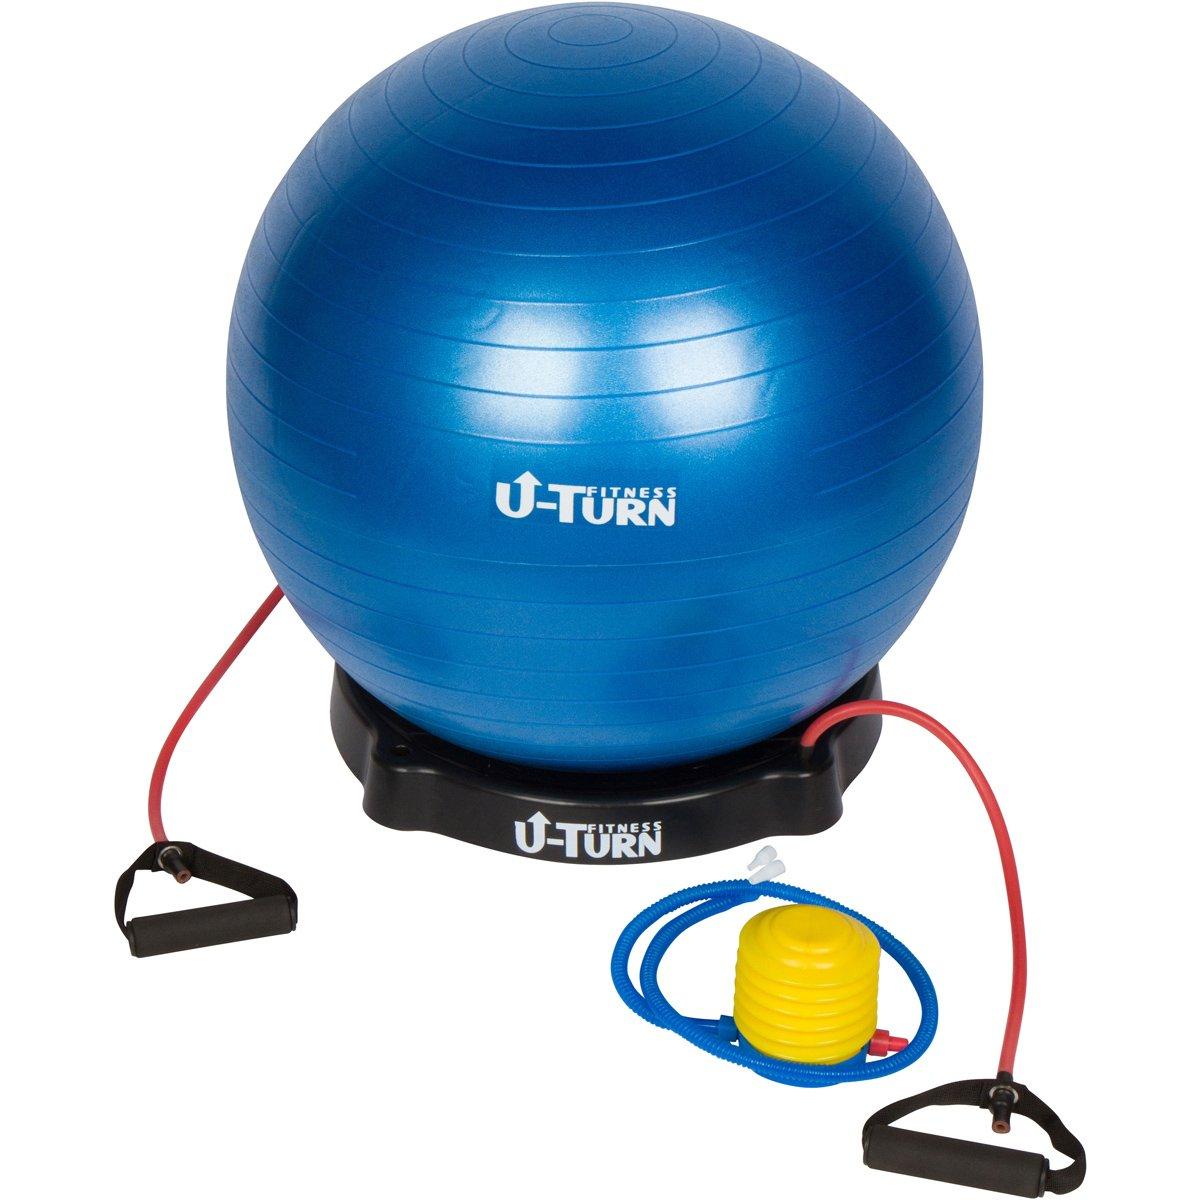 U-Turn Fitness Anti-Burst Physio Ball